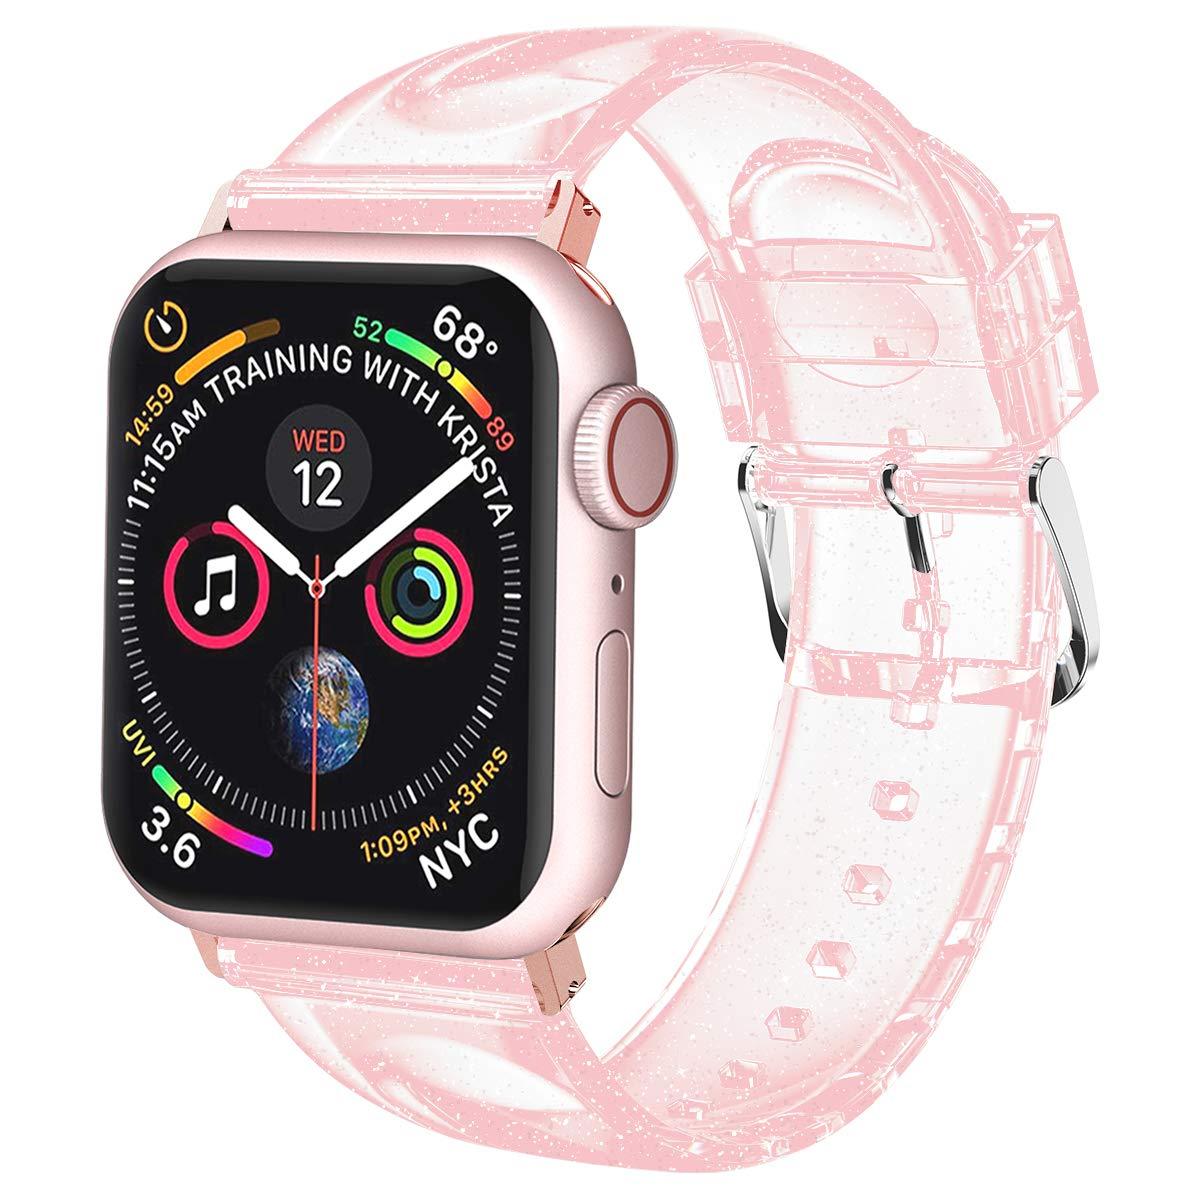 Malla Silicona para Apple Watch (42/44mm) IITEEOLOGY [VBCZP]